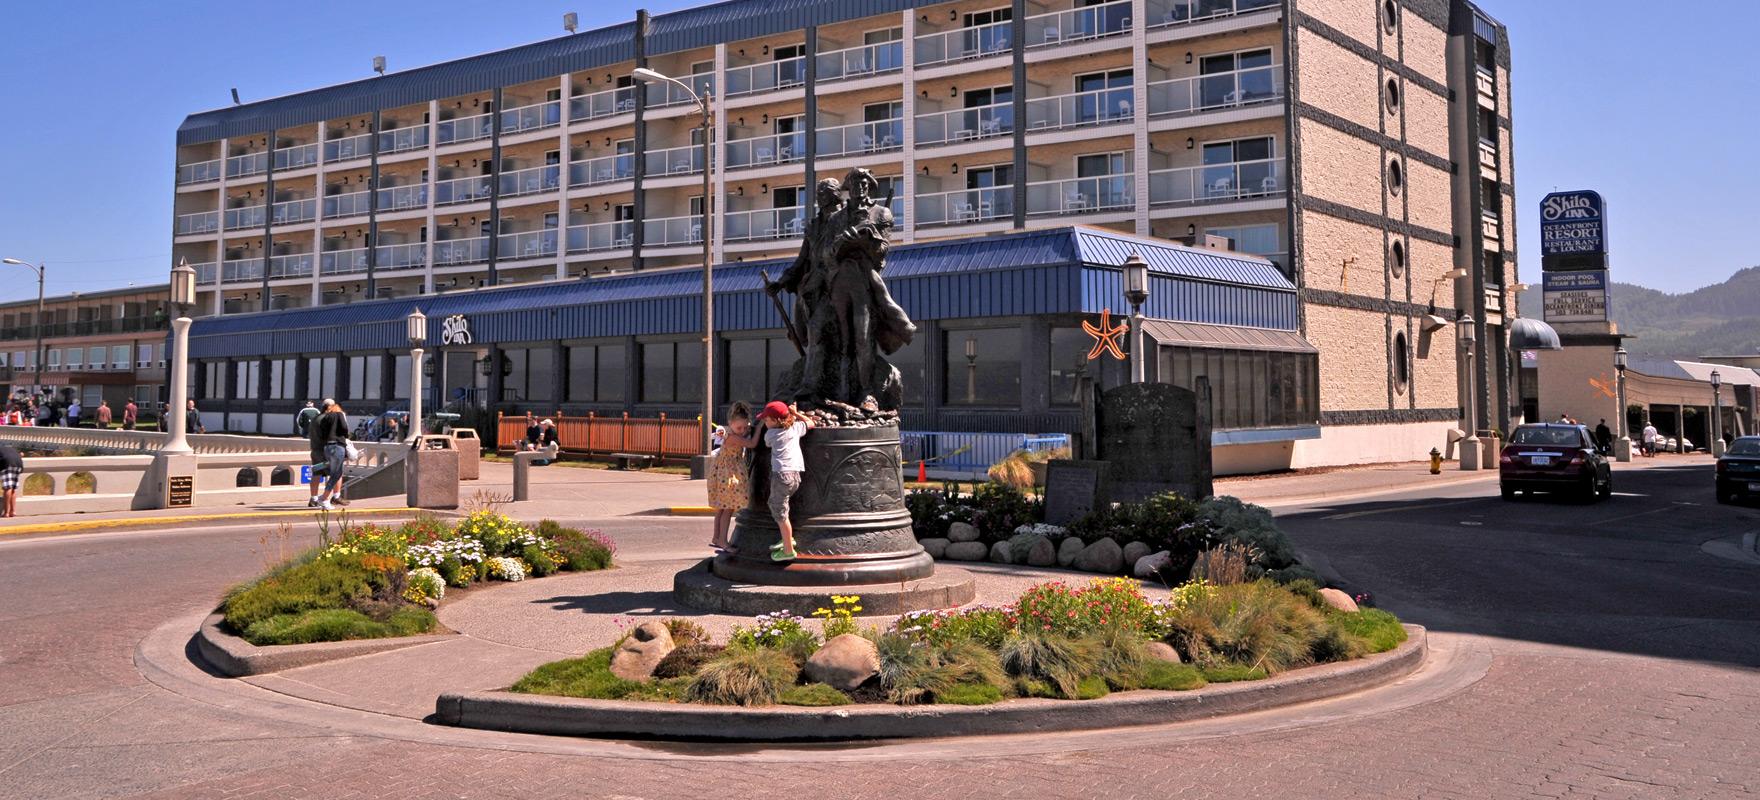 Shilo Inns Suites Hotels - Seaside Oceanfront